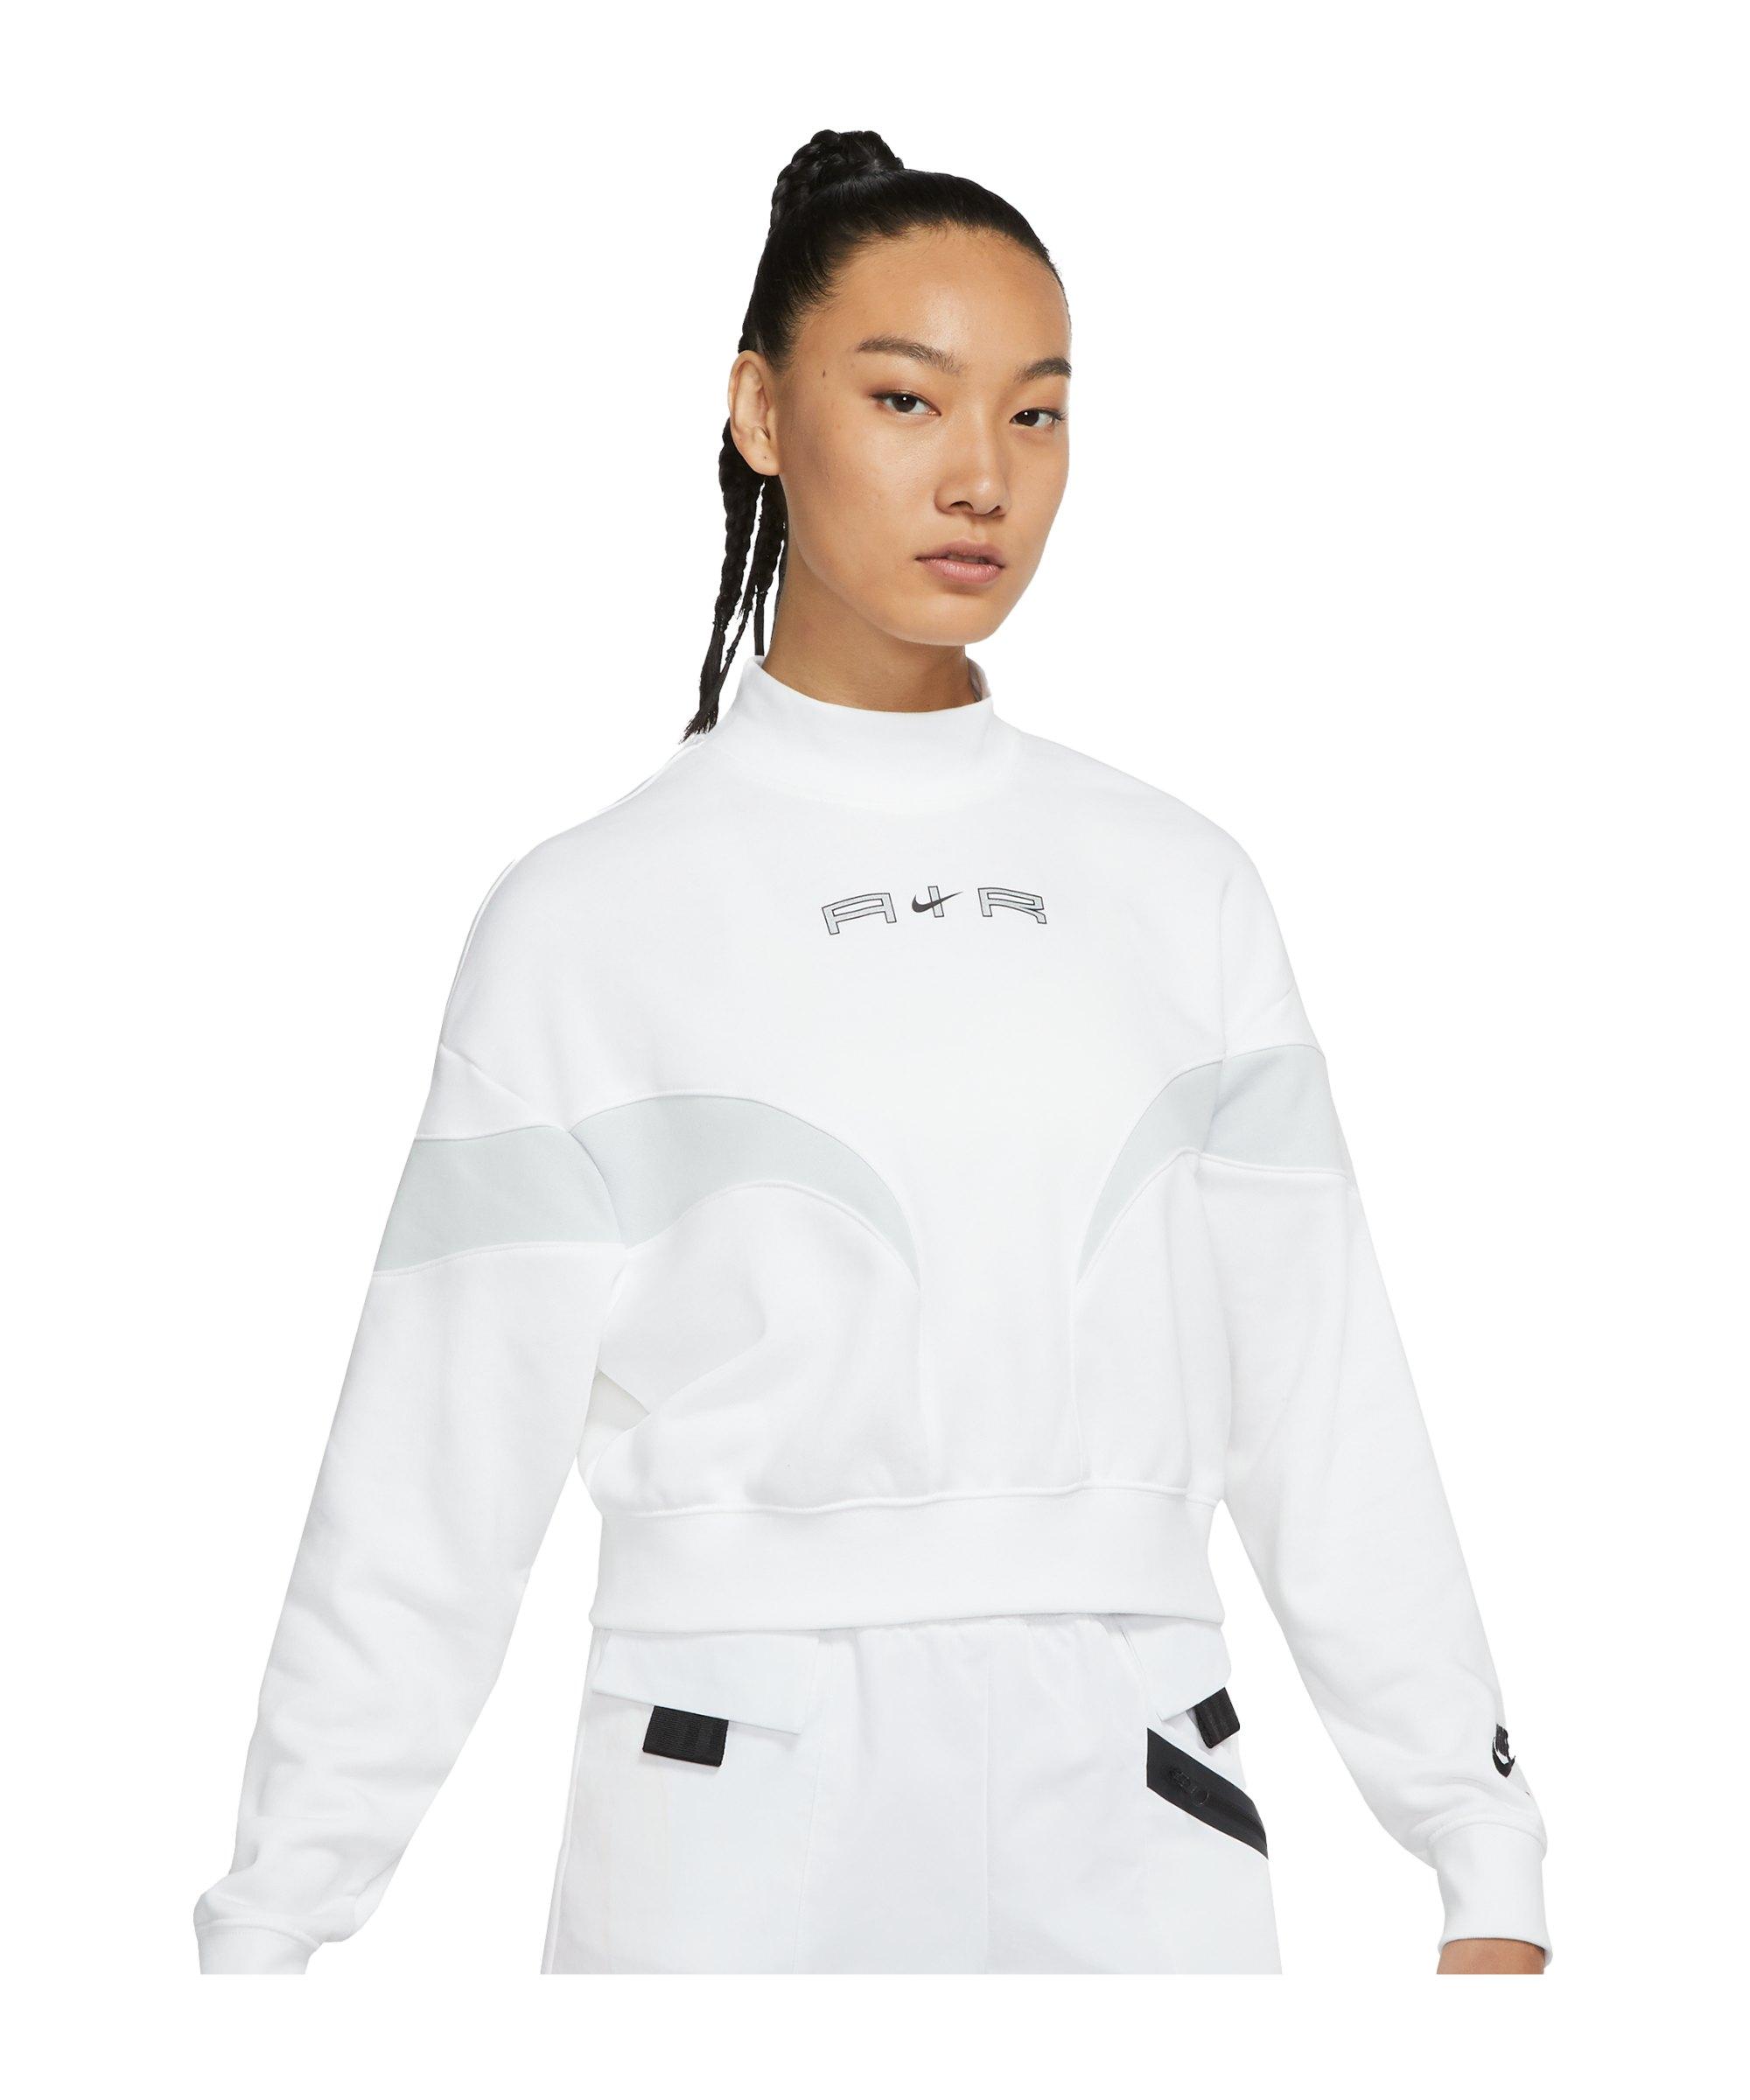 Nike Air Fleece Mock Sweatshirt Damen Weiss F100 - weiss